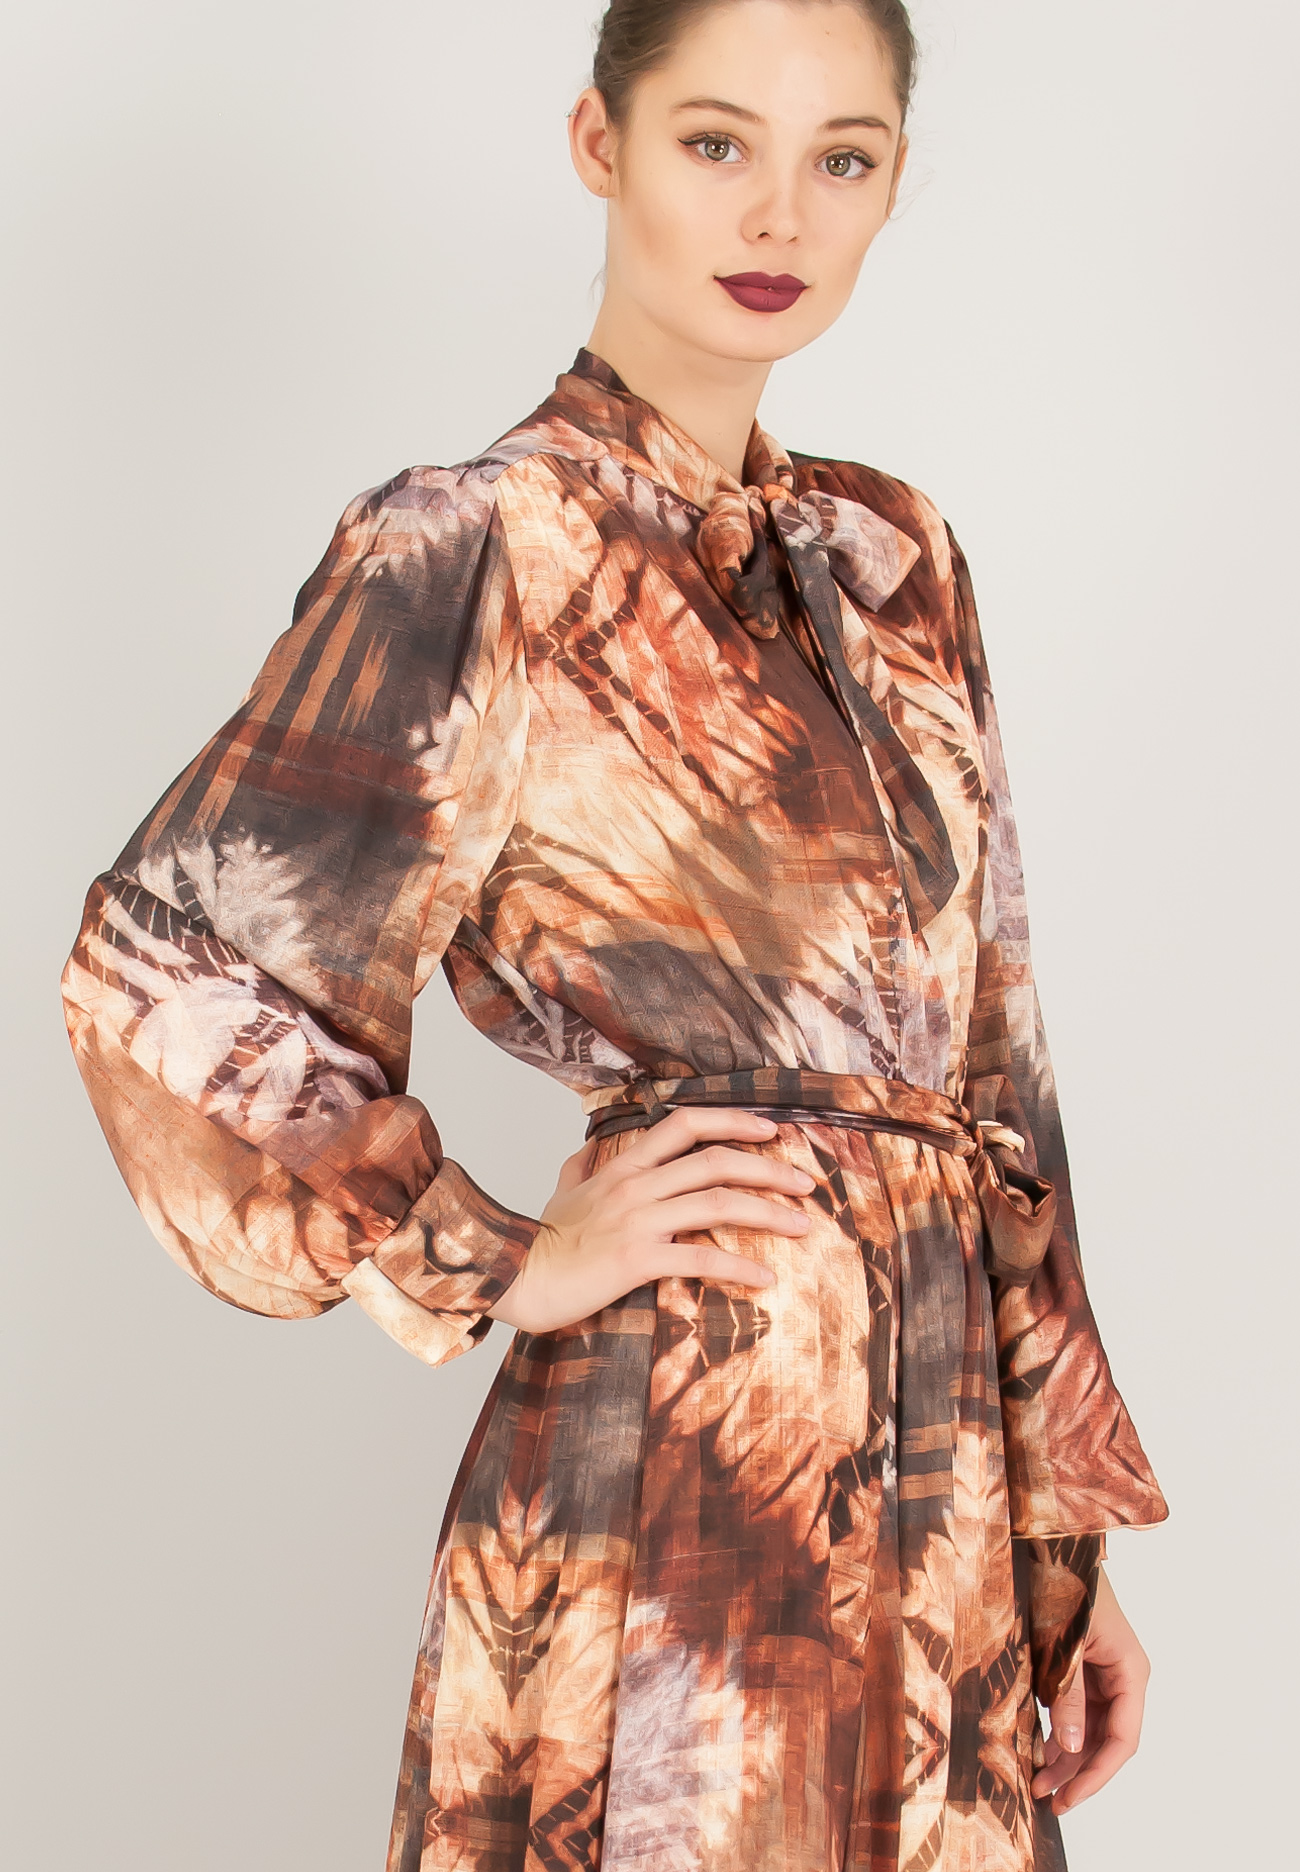 001aafeeefb1 Maxi σατέν φόρεμα με δέσιμο στο λαιμό.